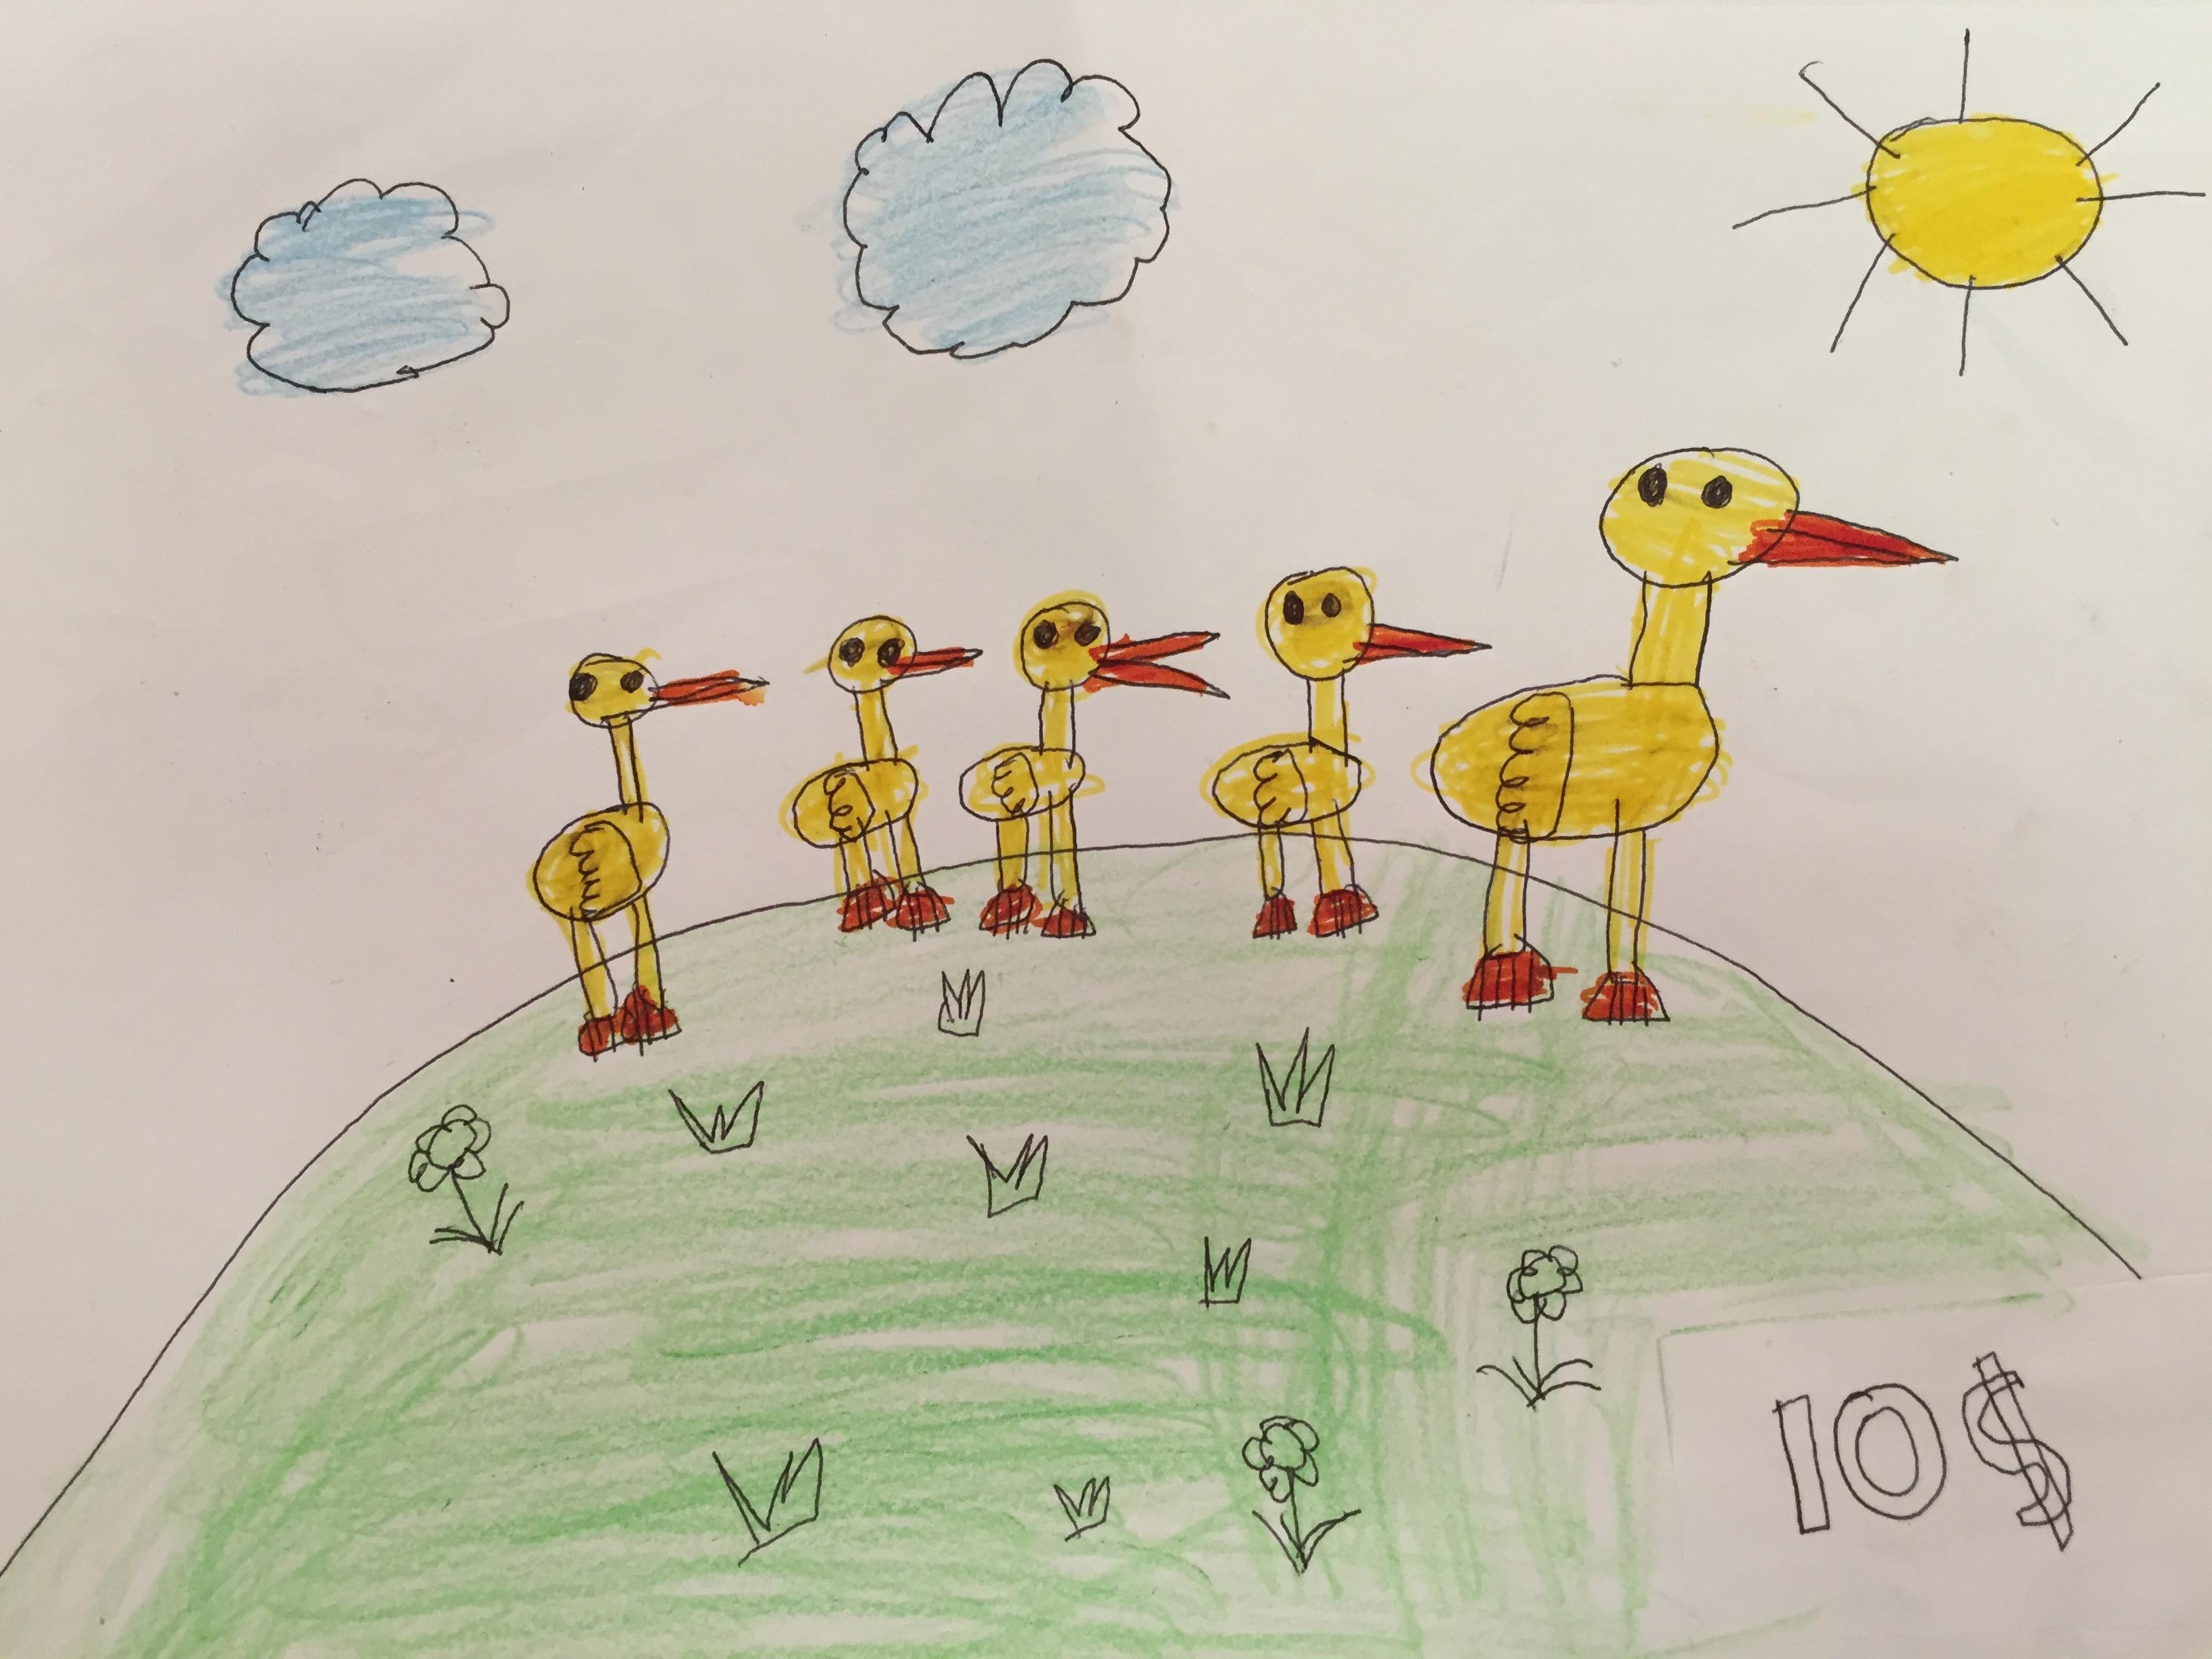 Baby ducks following a Mother Duck